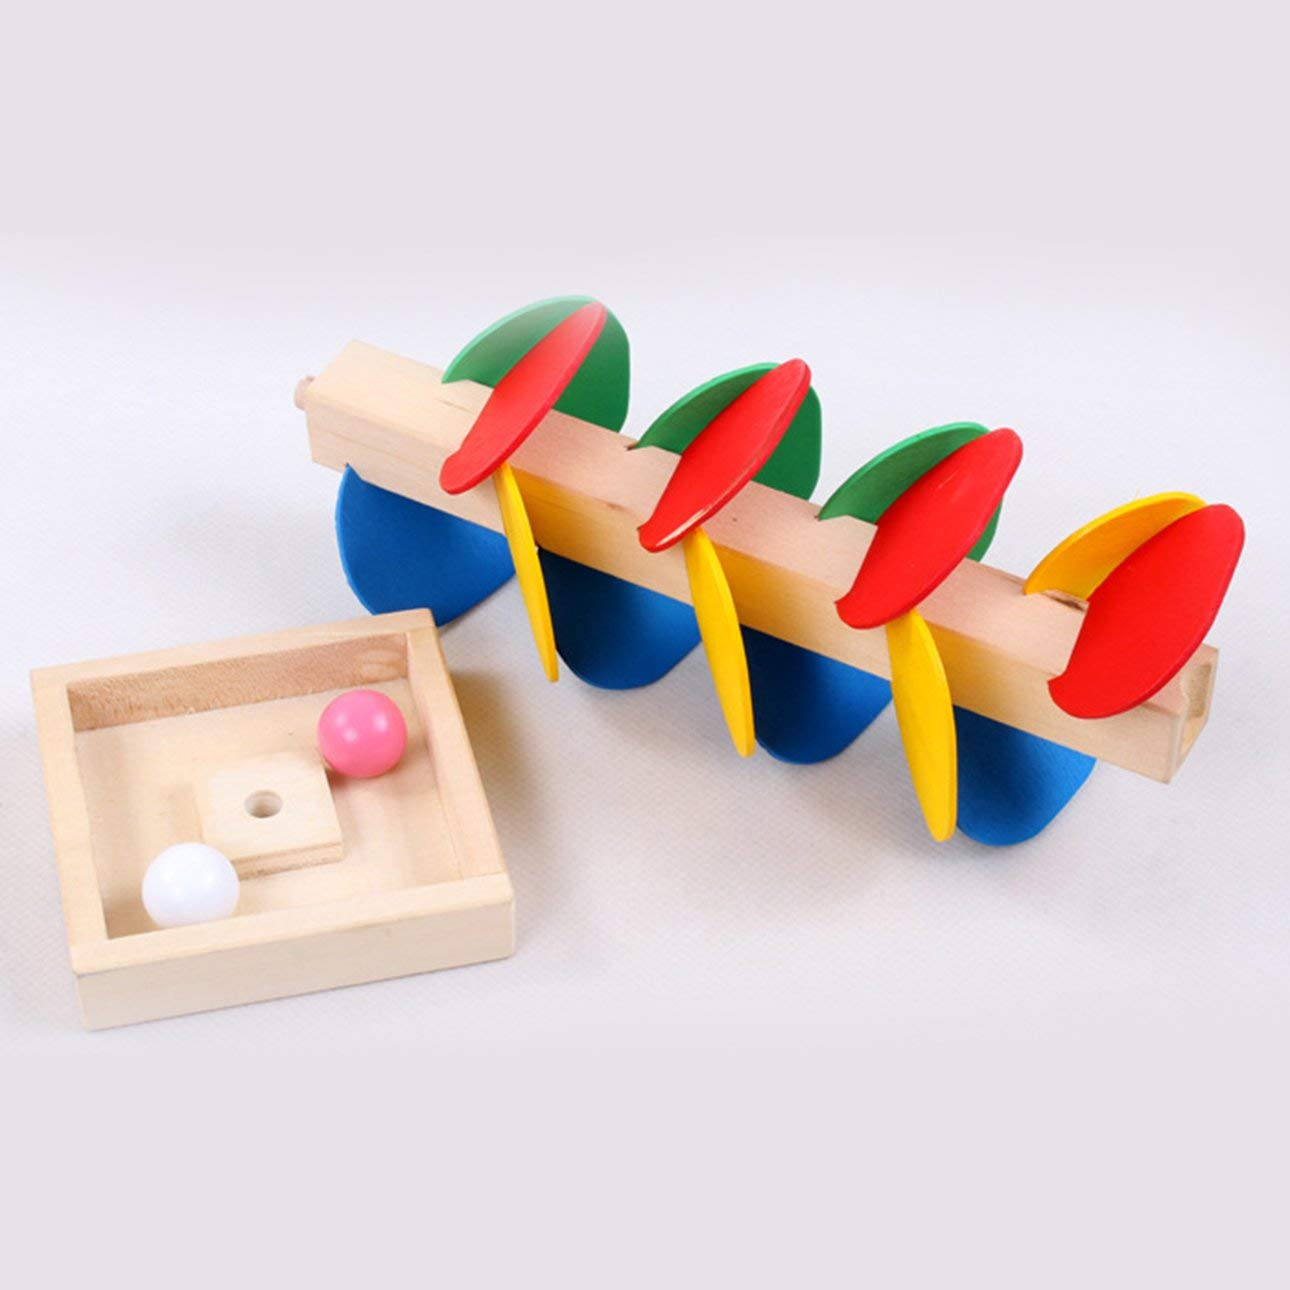 Ballylelly Montessori Juguete Educativo Á rbol de Madera Bola de Má rmol Juego de Atletismo Niñ os Juguete